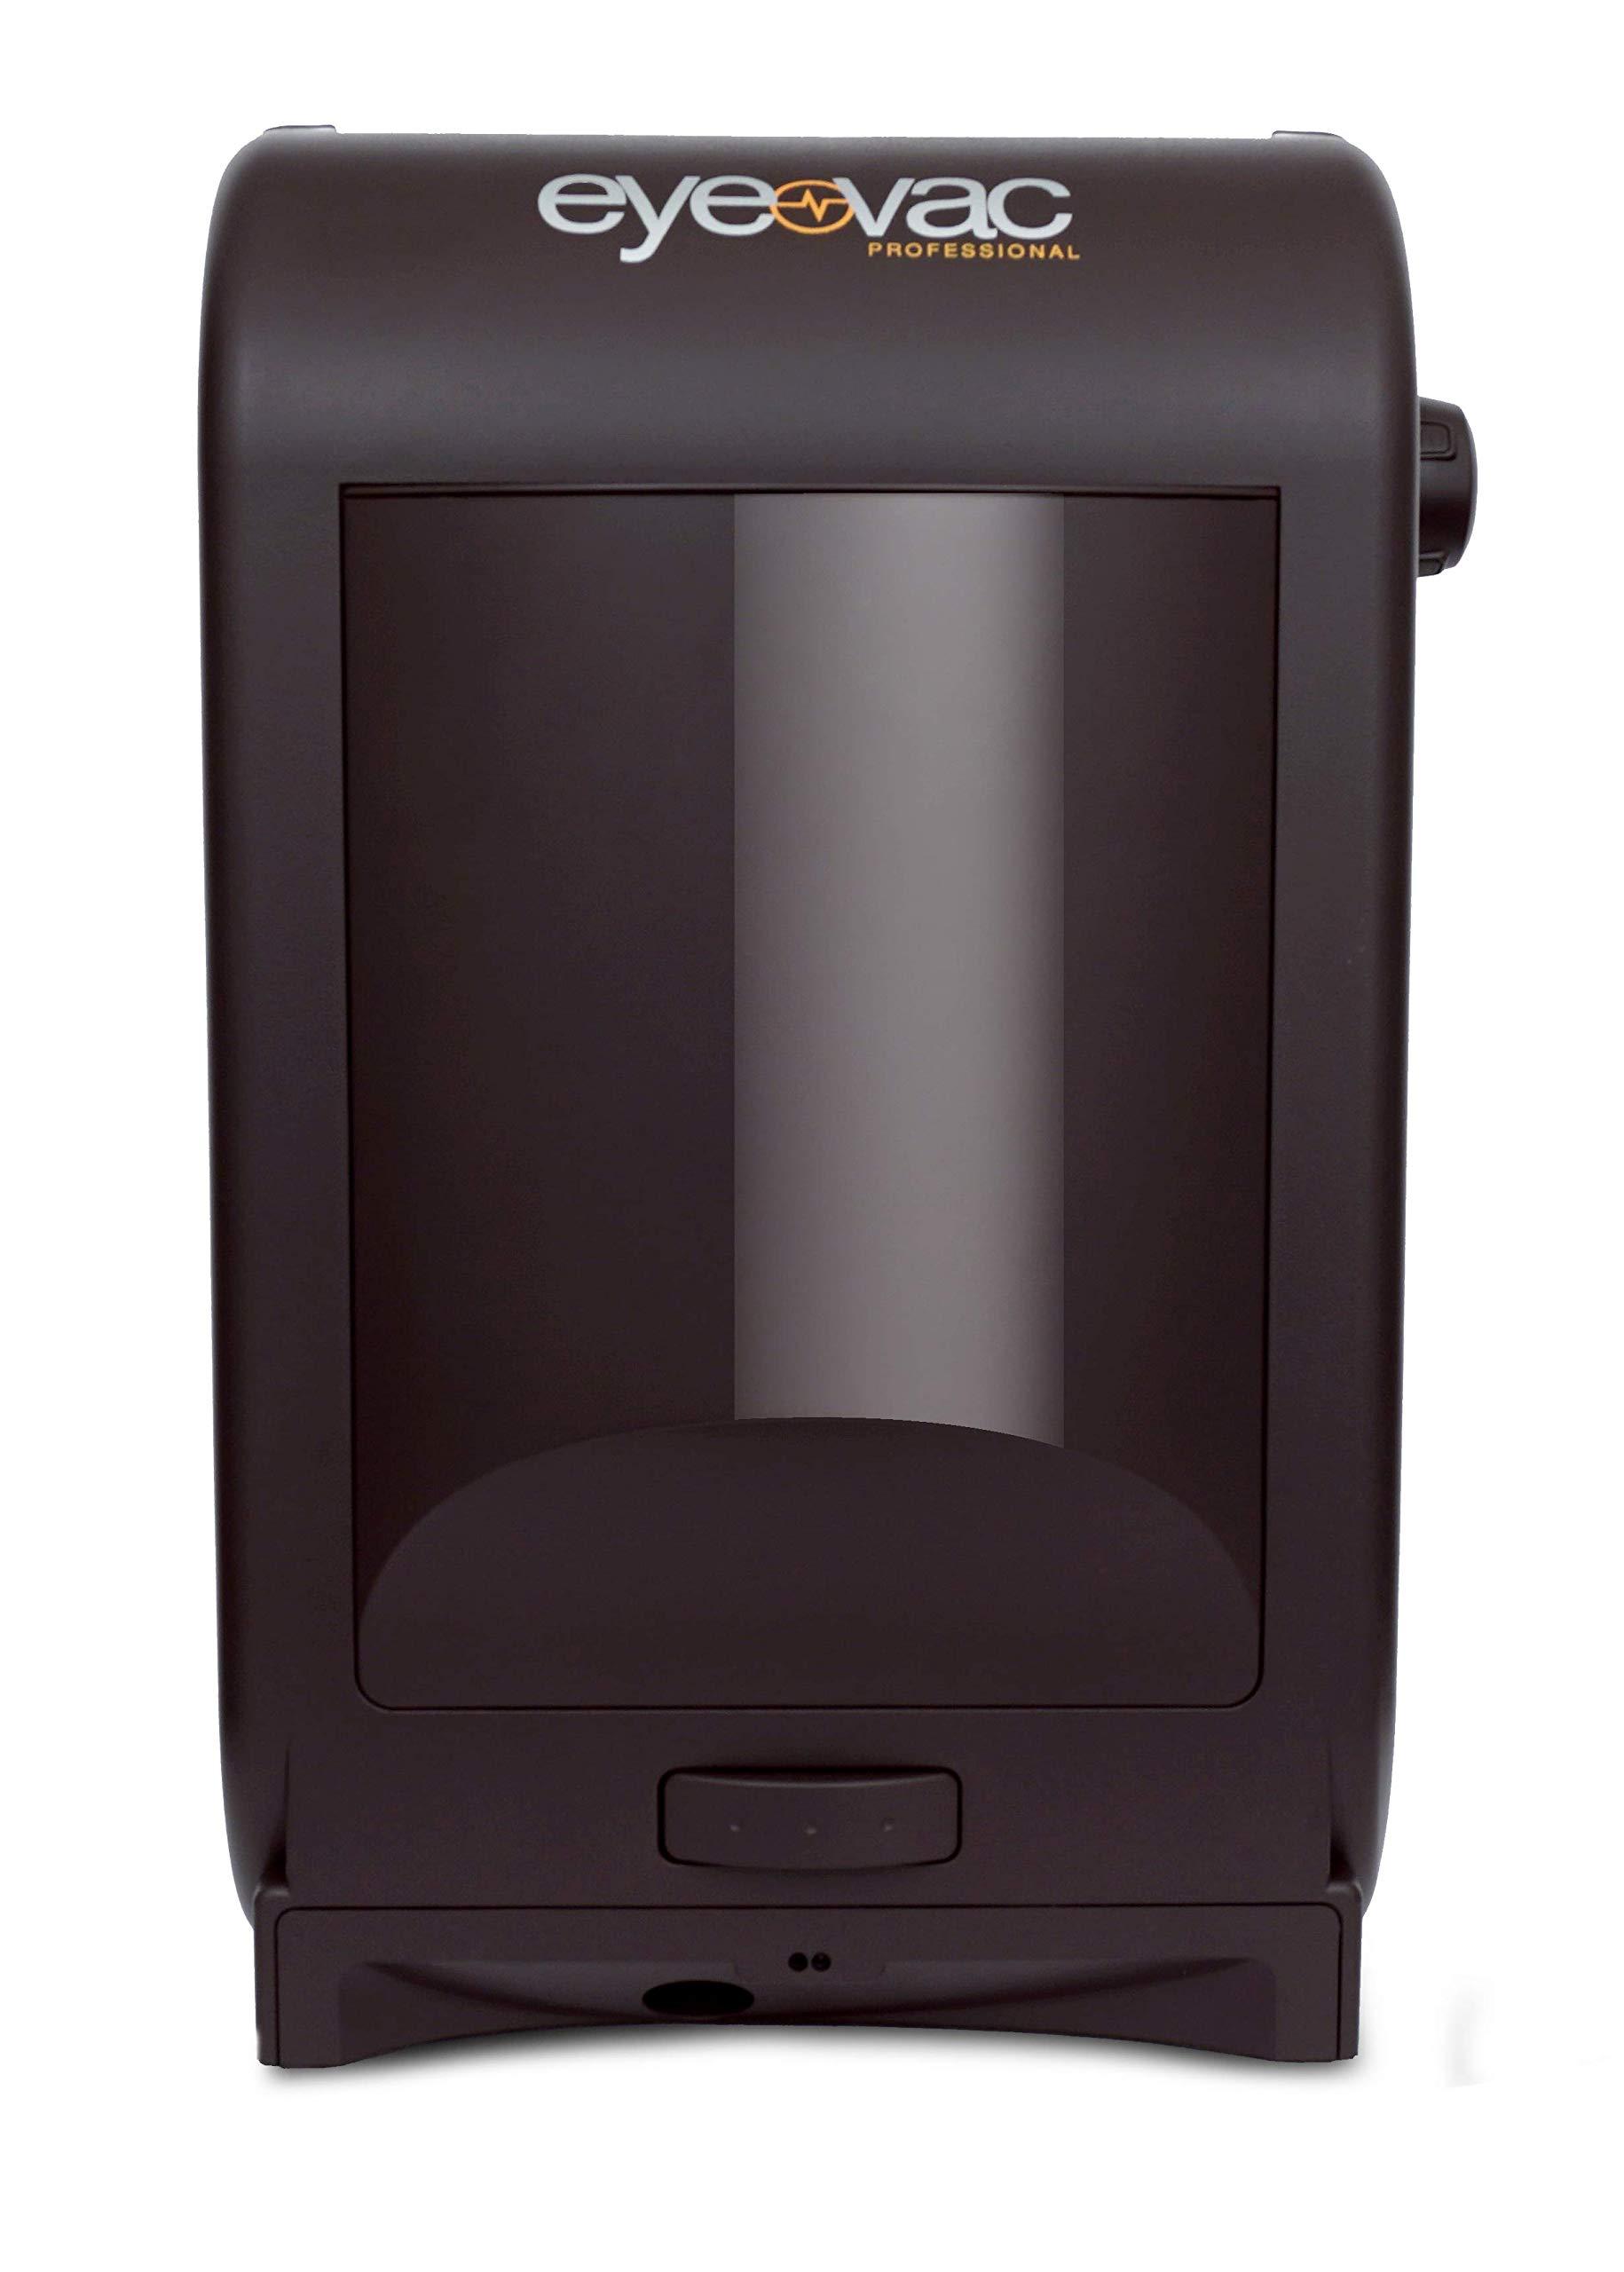 EyeVac Professional Touchless Stationary Vacuum. Limited Edition- Bronze by EyeVac